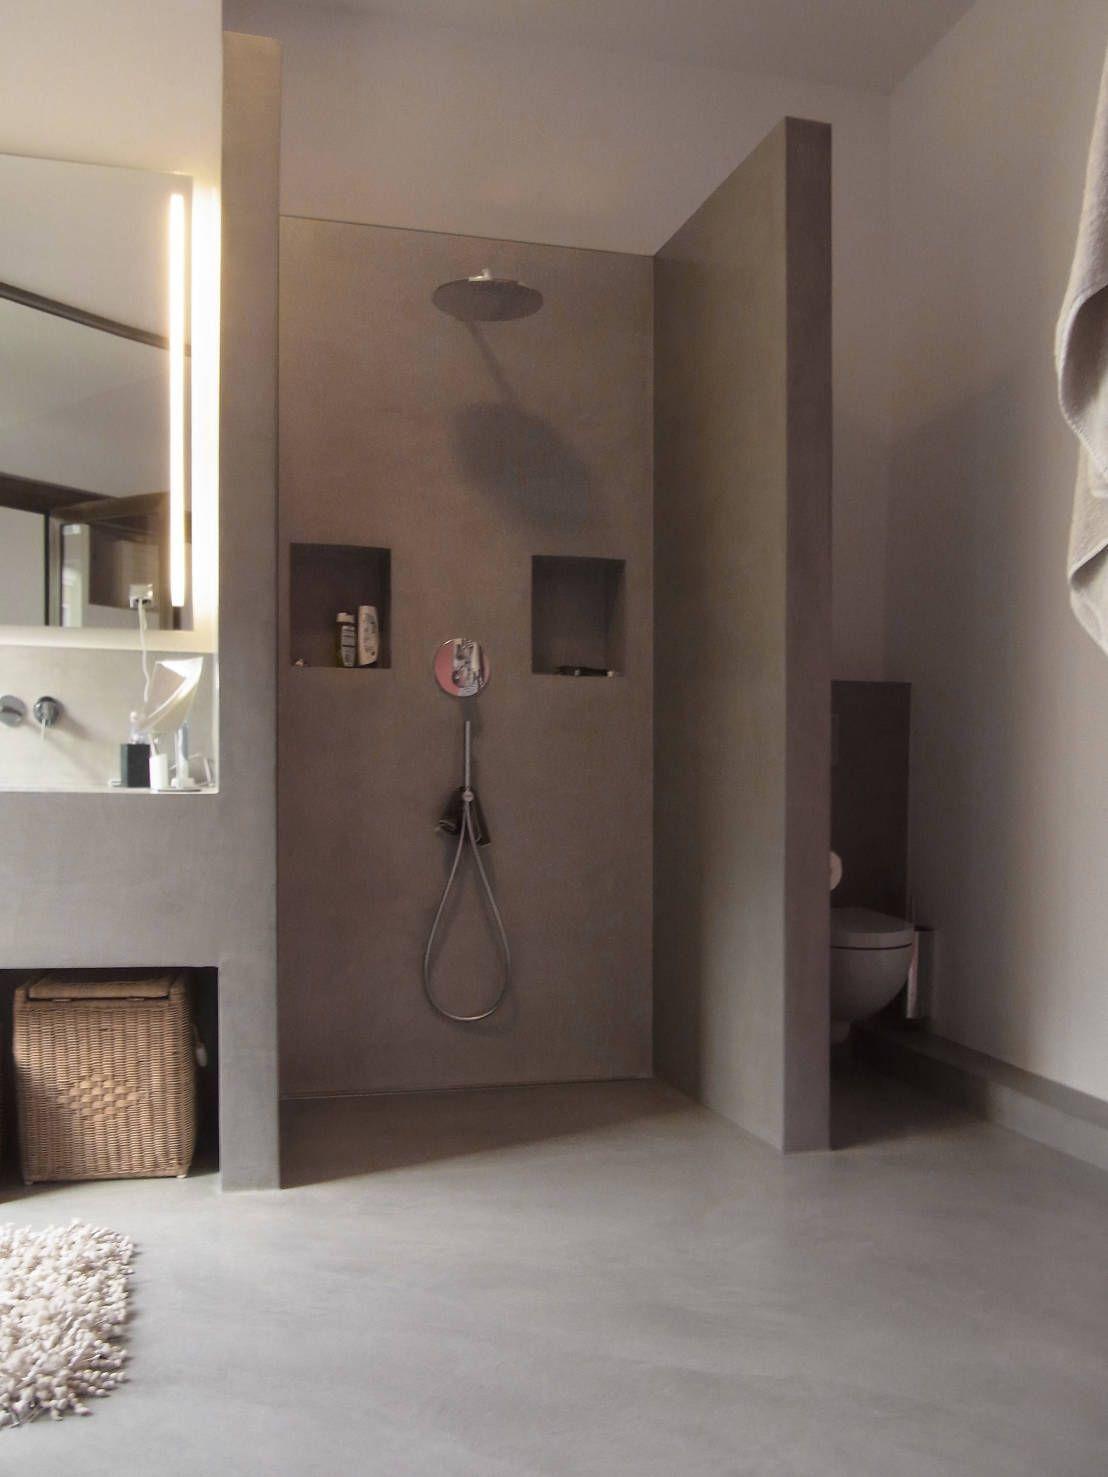 Moderne Badezimmer Ohne Wanne Badezimmer Offenes Badezimmer